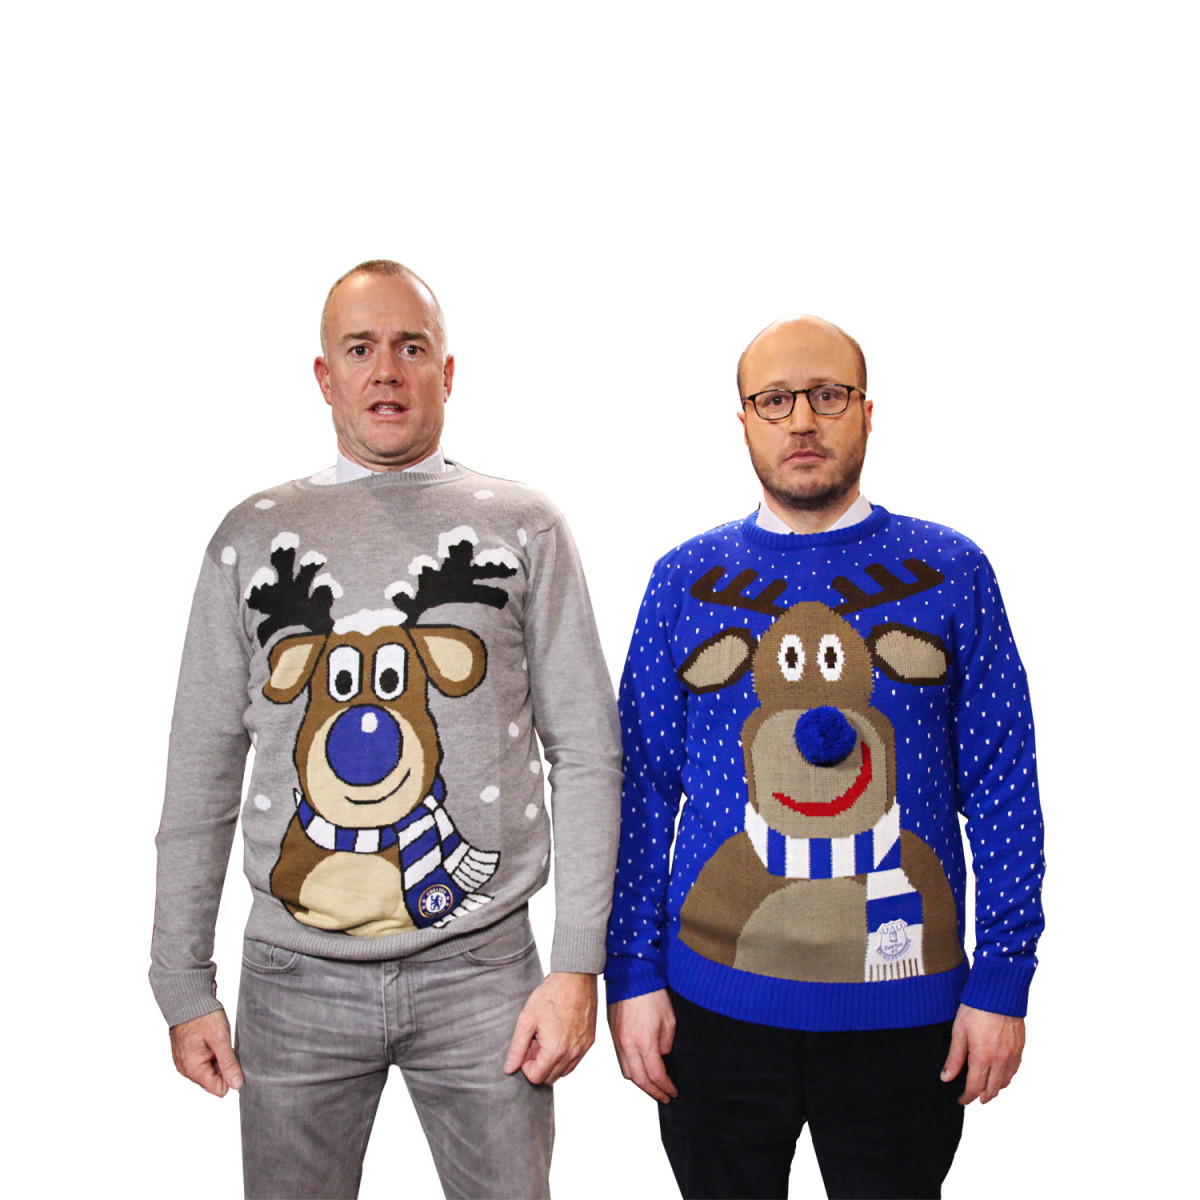 suboptimalsweaters.jpg